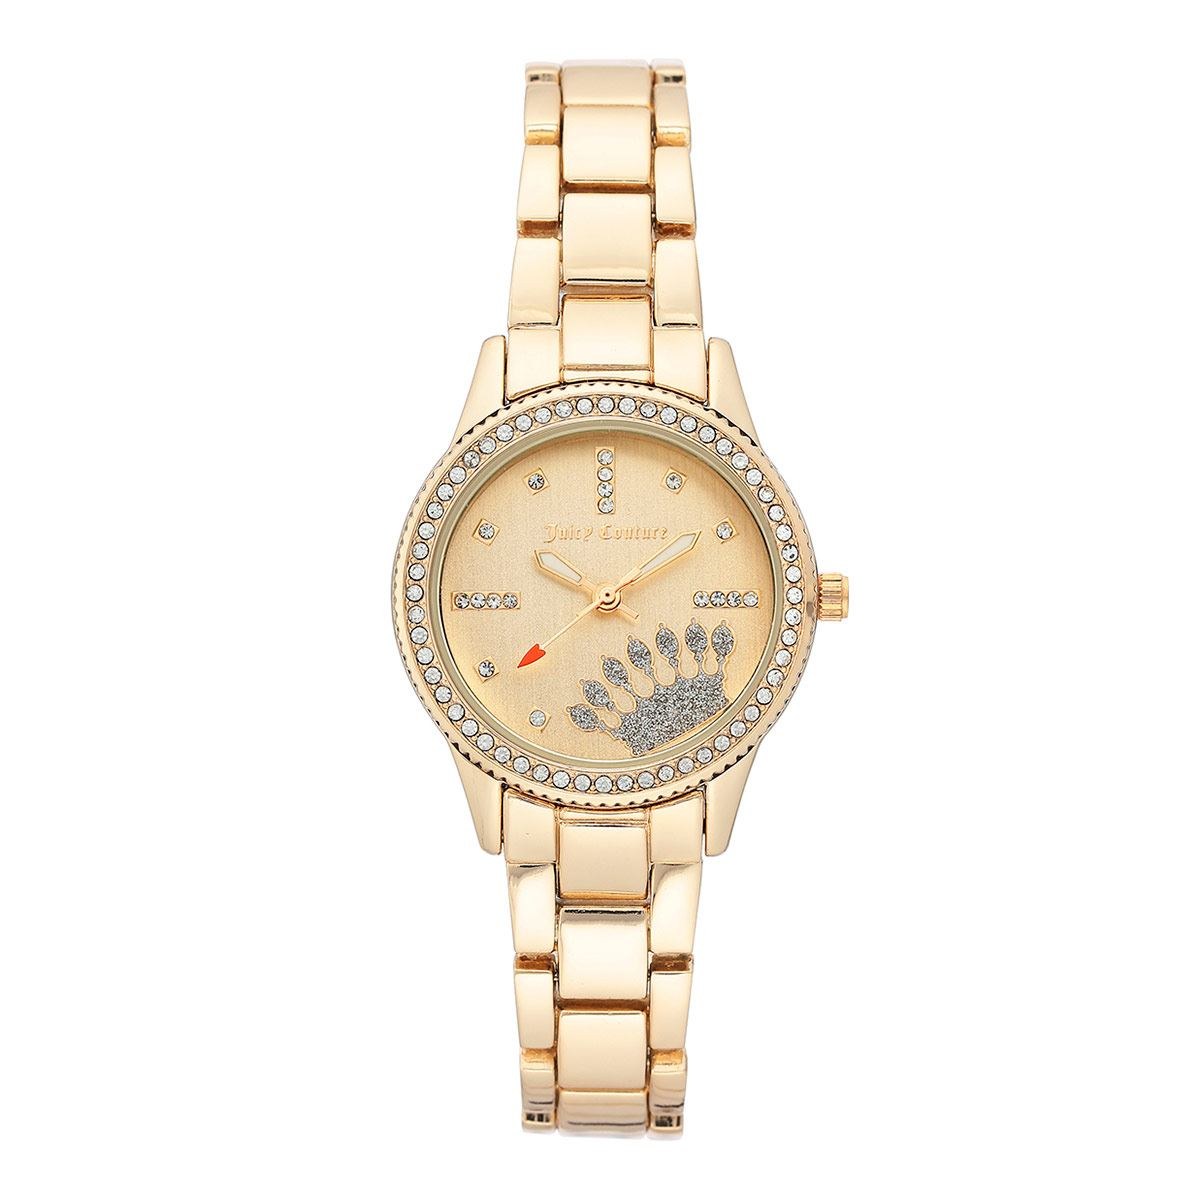 Reloj Juicy Couture Dorado JC1110CHGB